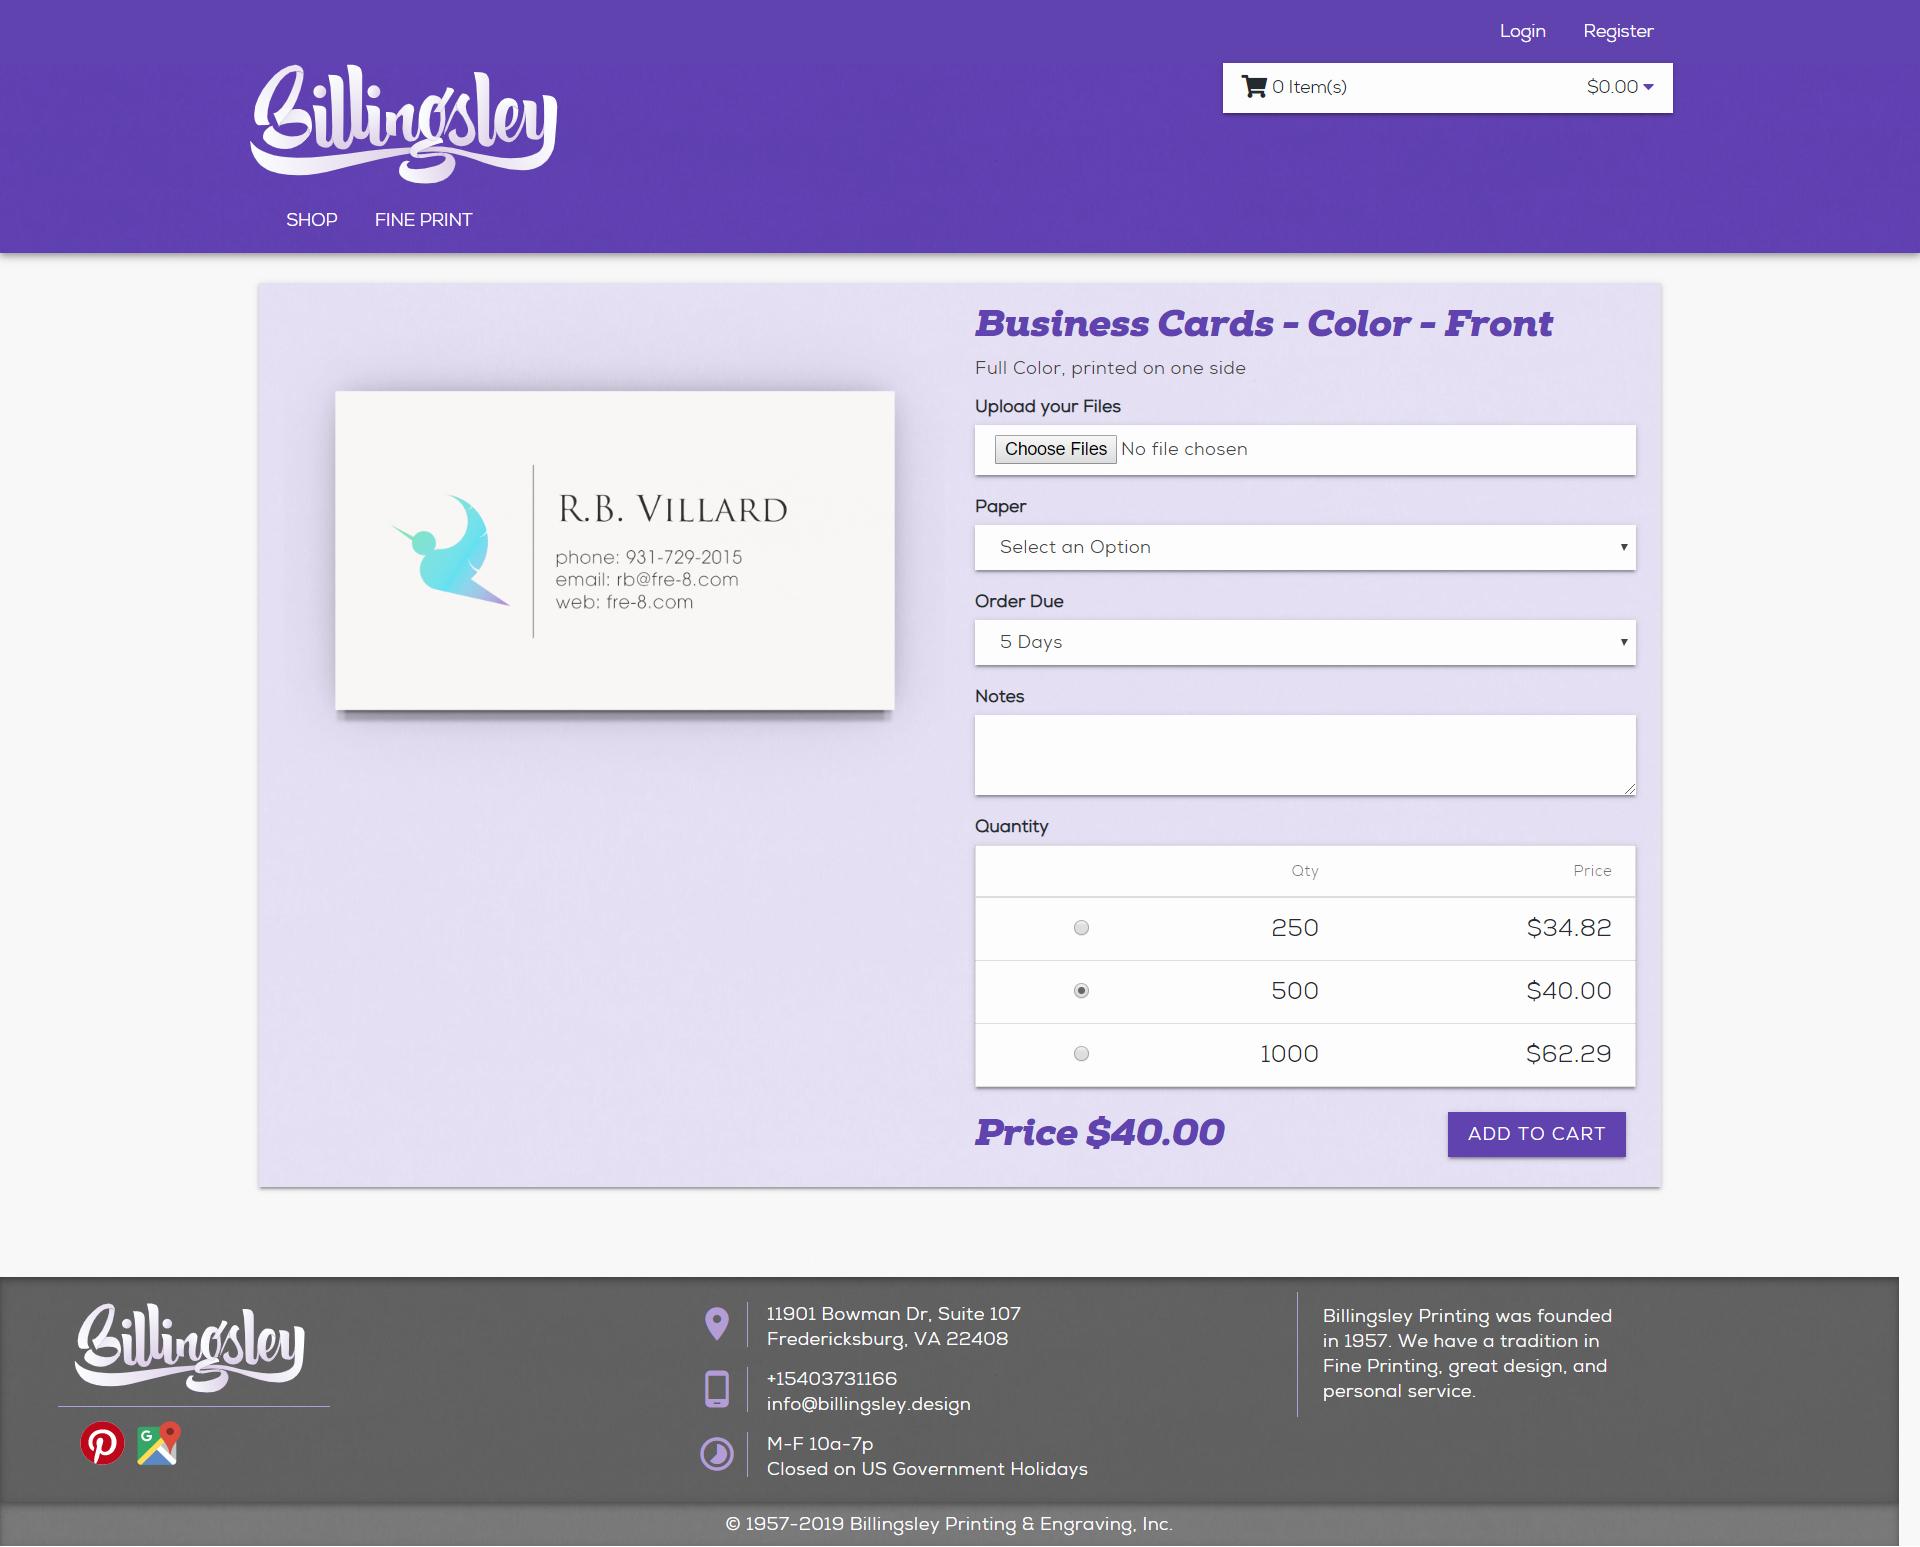 screencapture-billingsley-orderprintnow-ProductDetails-aspx-2019-08-09-10_08_16